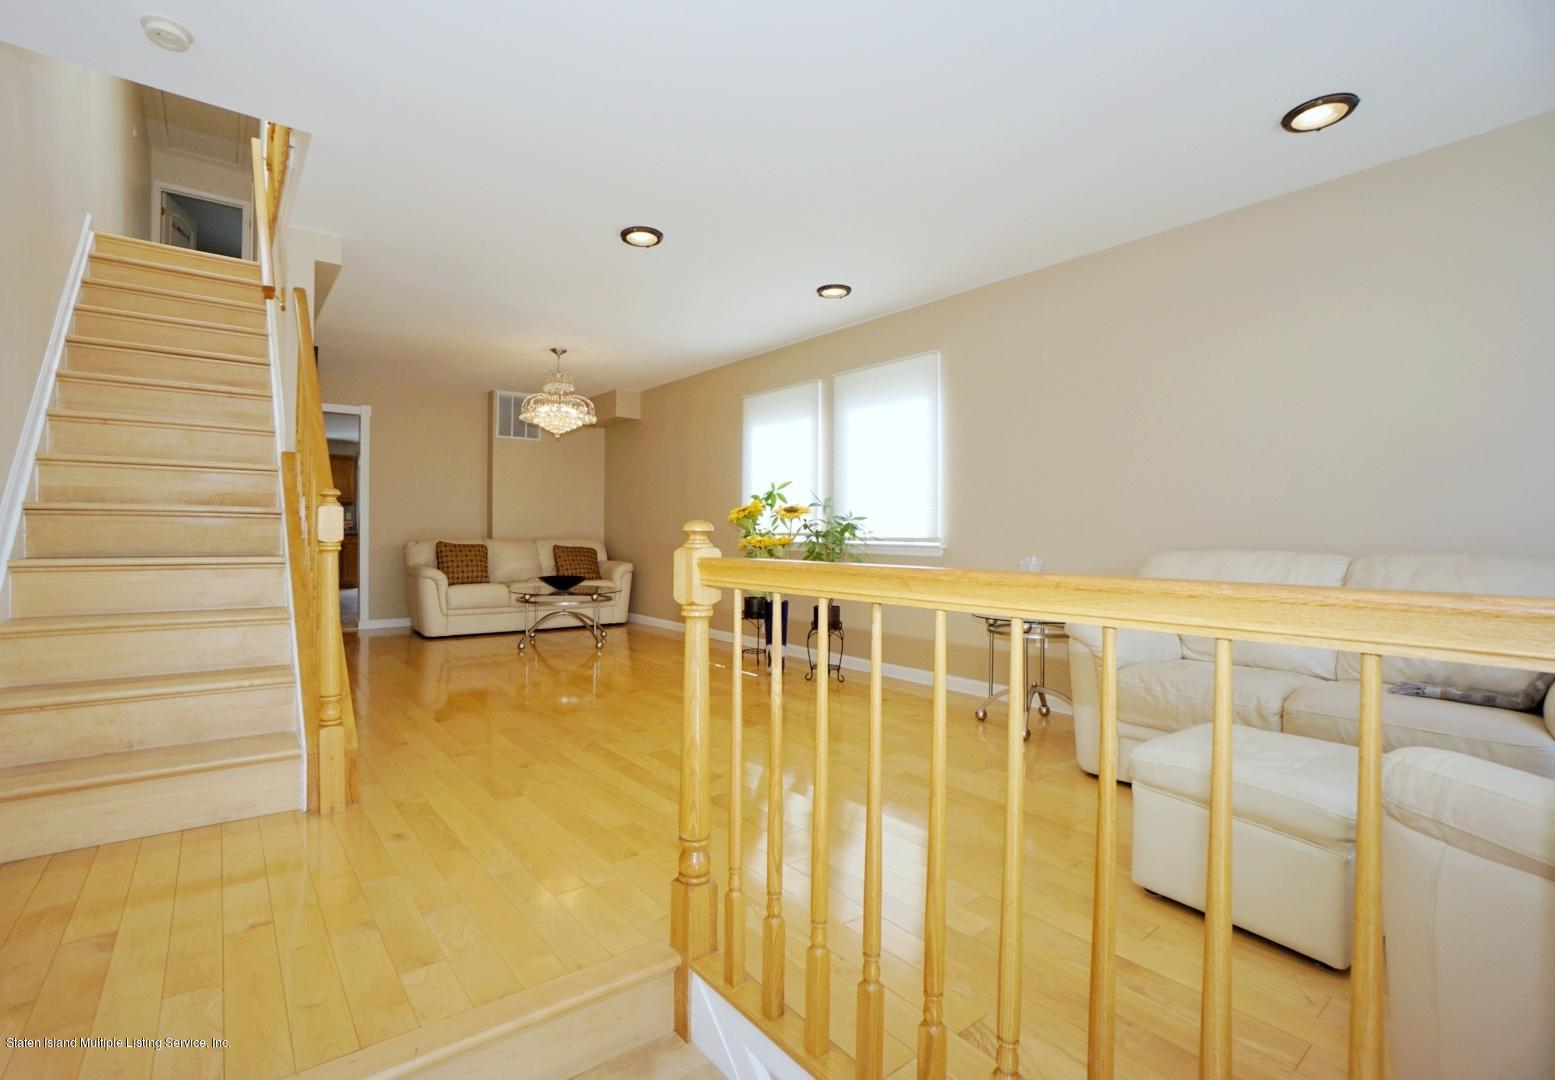 Single Family - Semi-Attached 18 Dunhill Lane  Staten Island, NY 10309, MLS-1139055-3